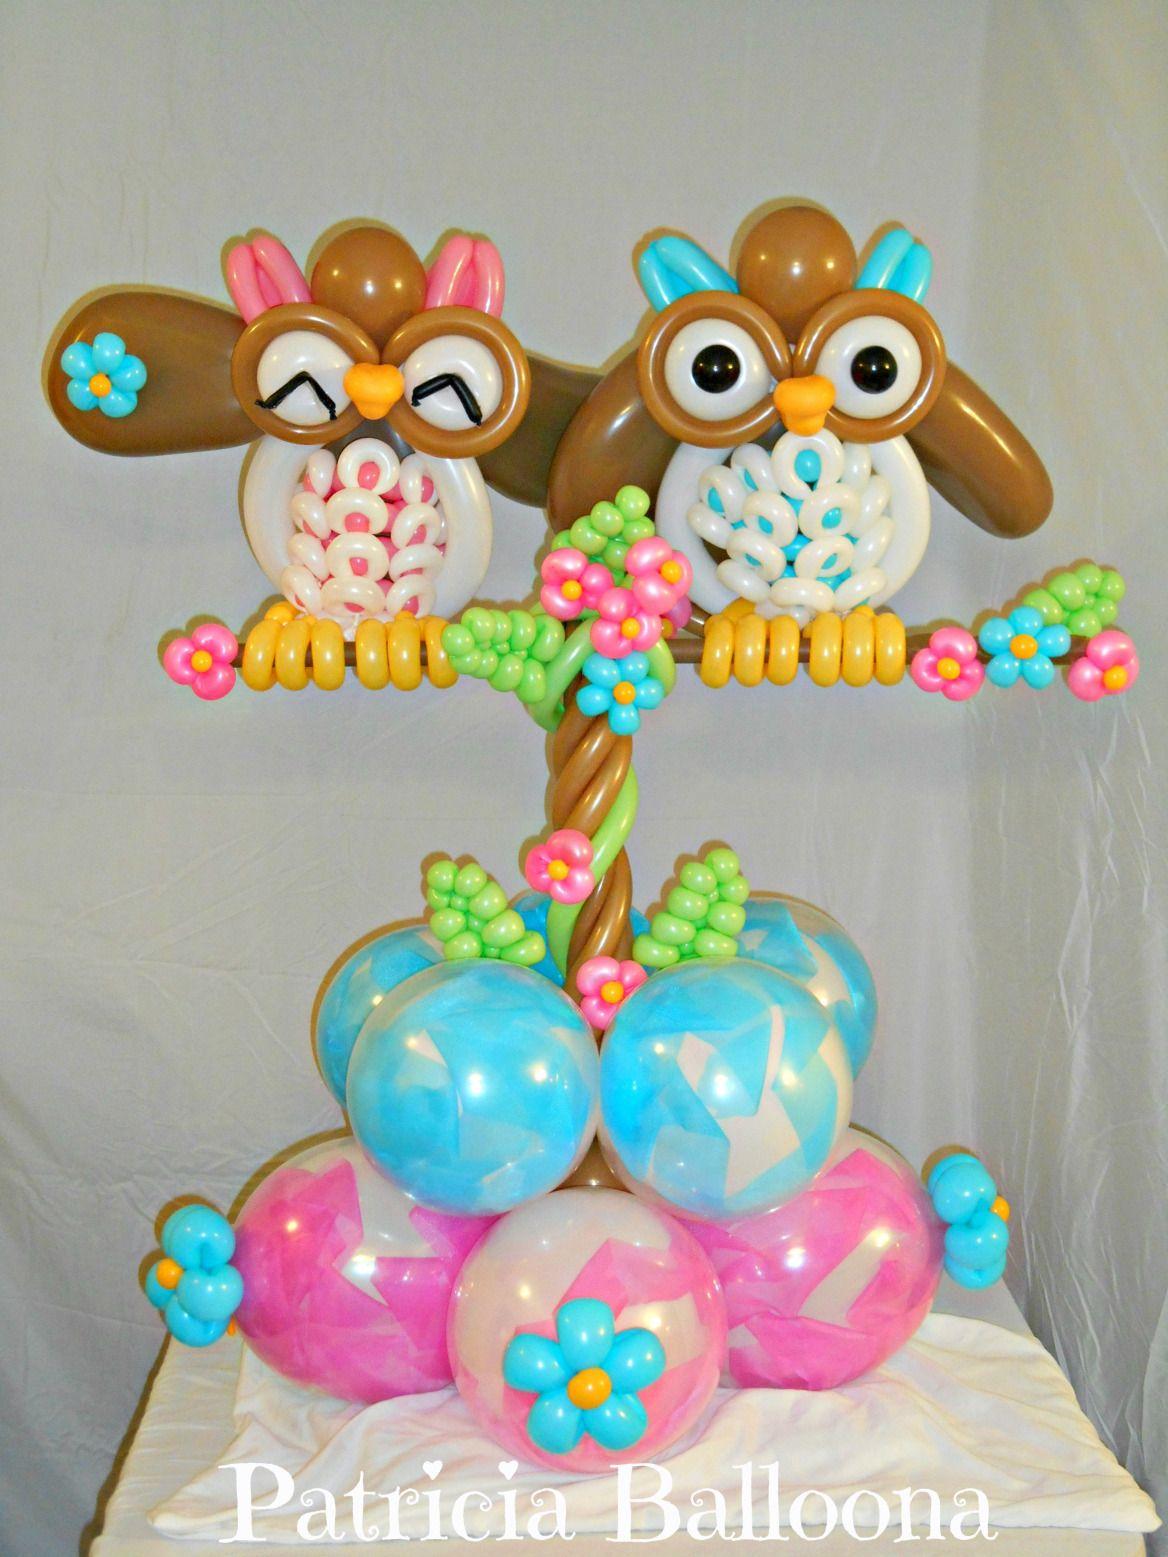 Balloon Owl Patricia Balloona Party Down Balloons Owl